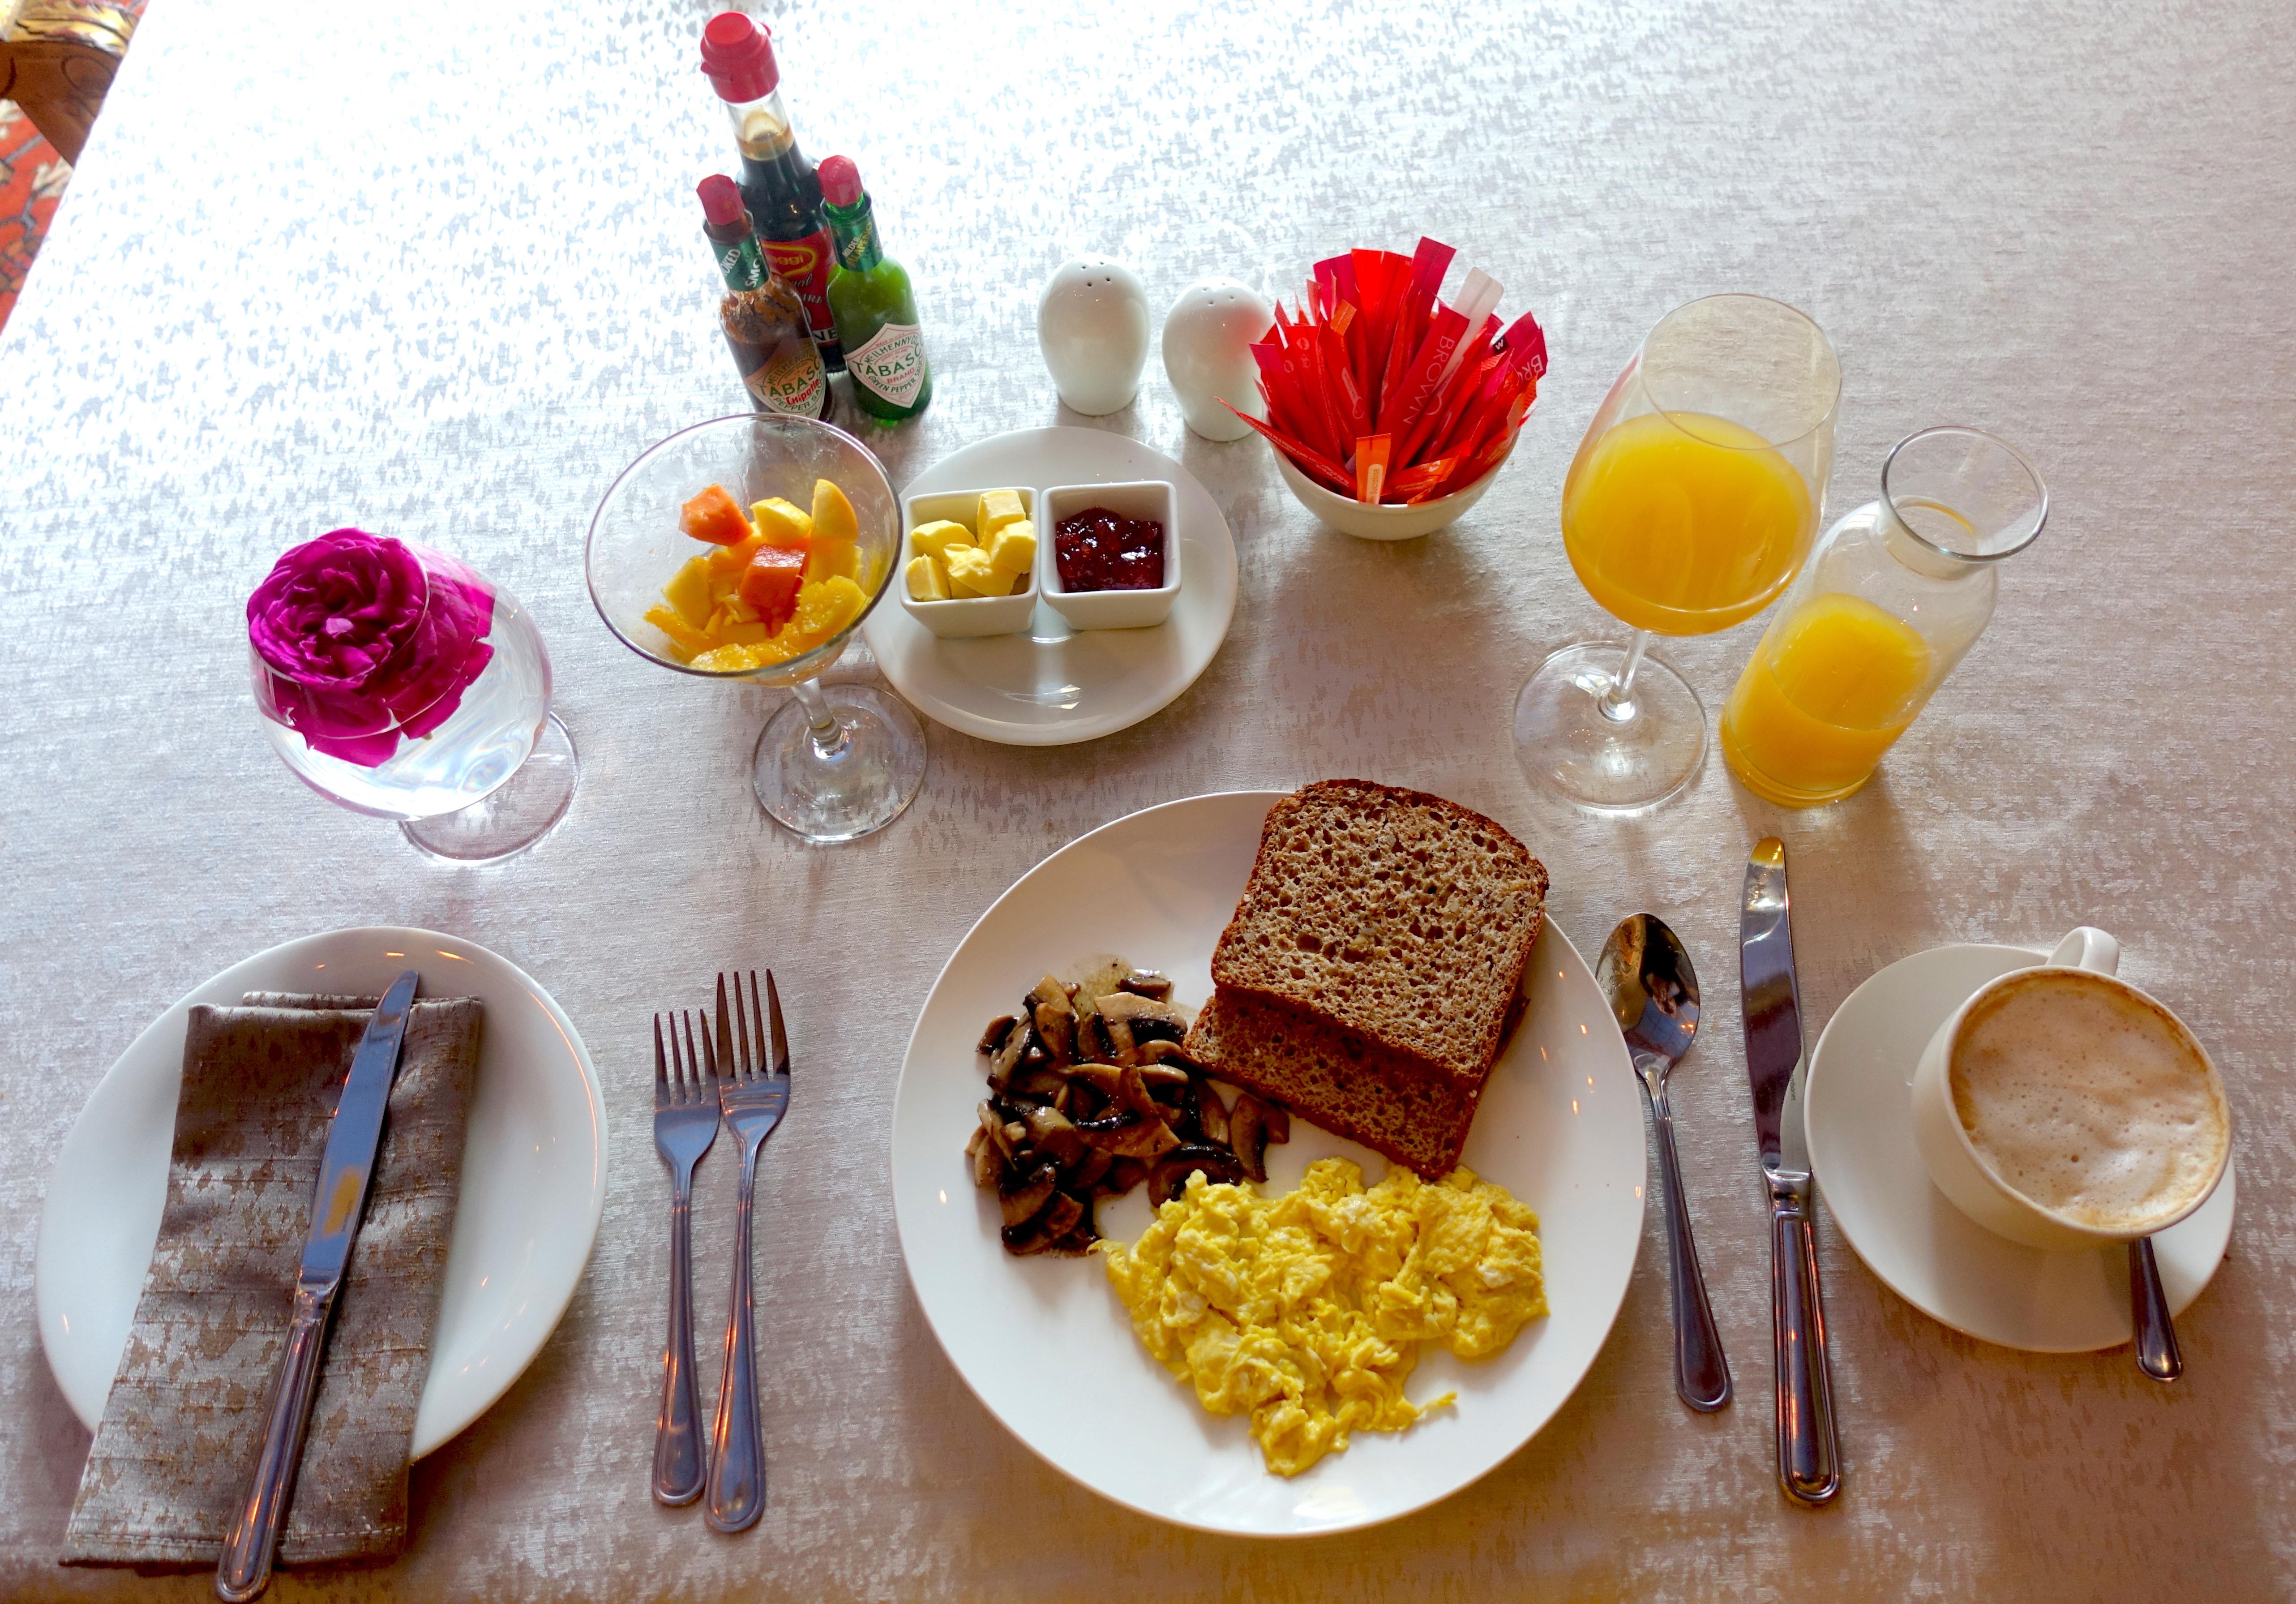 munro-hotel-breakfast-johannesburg-lustforthesublime